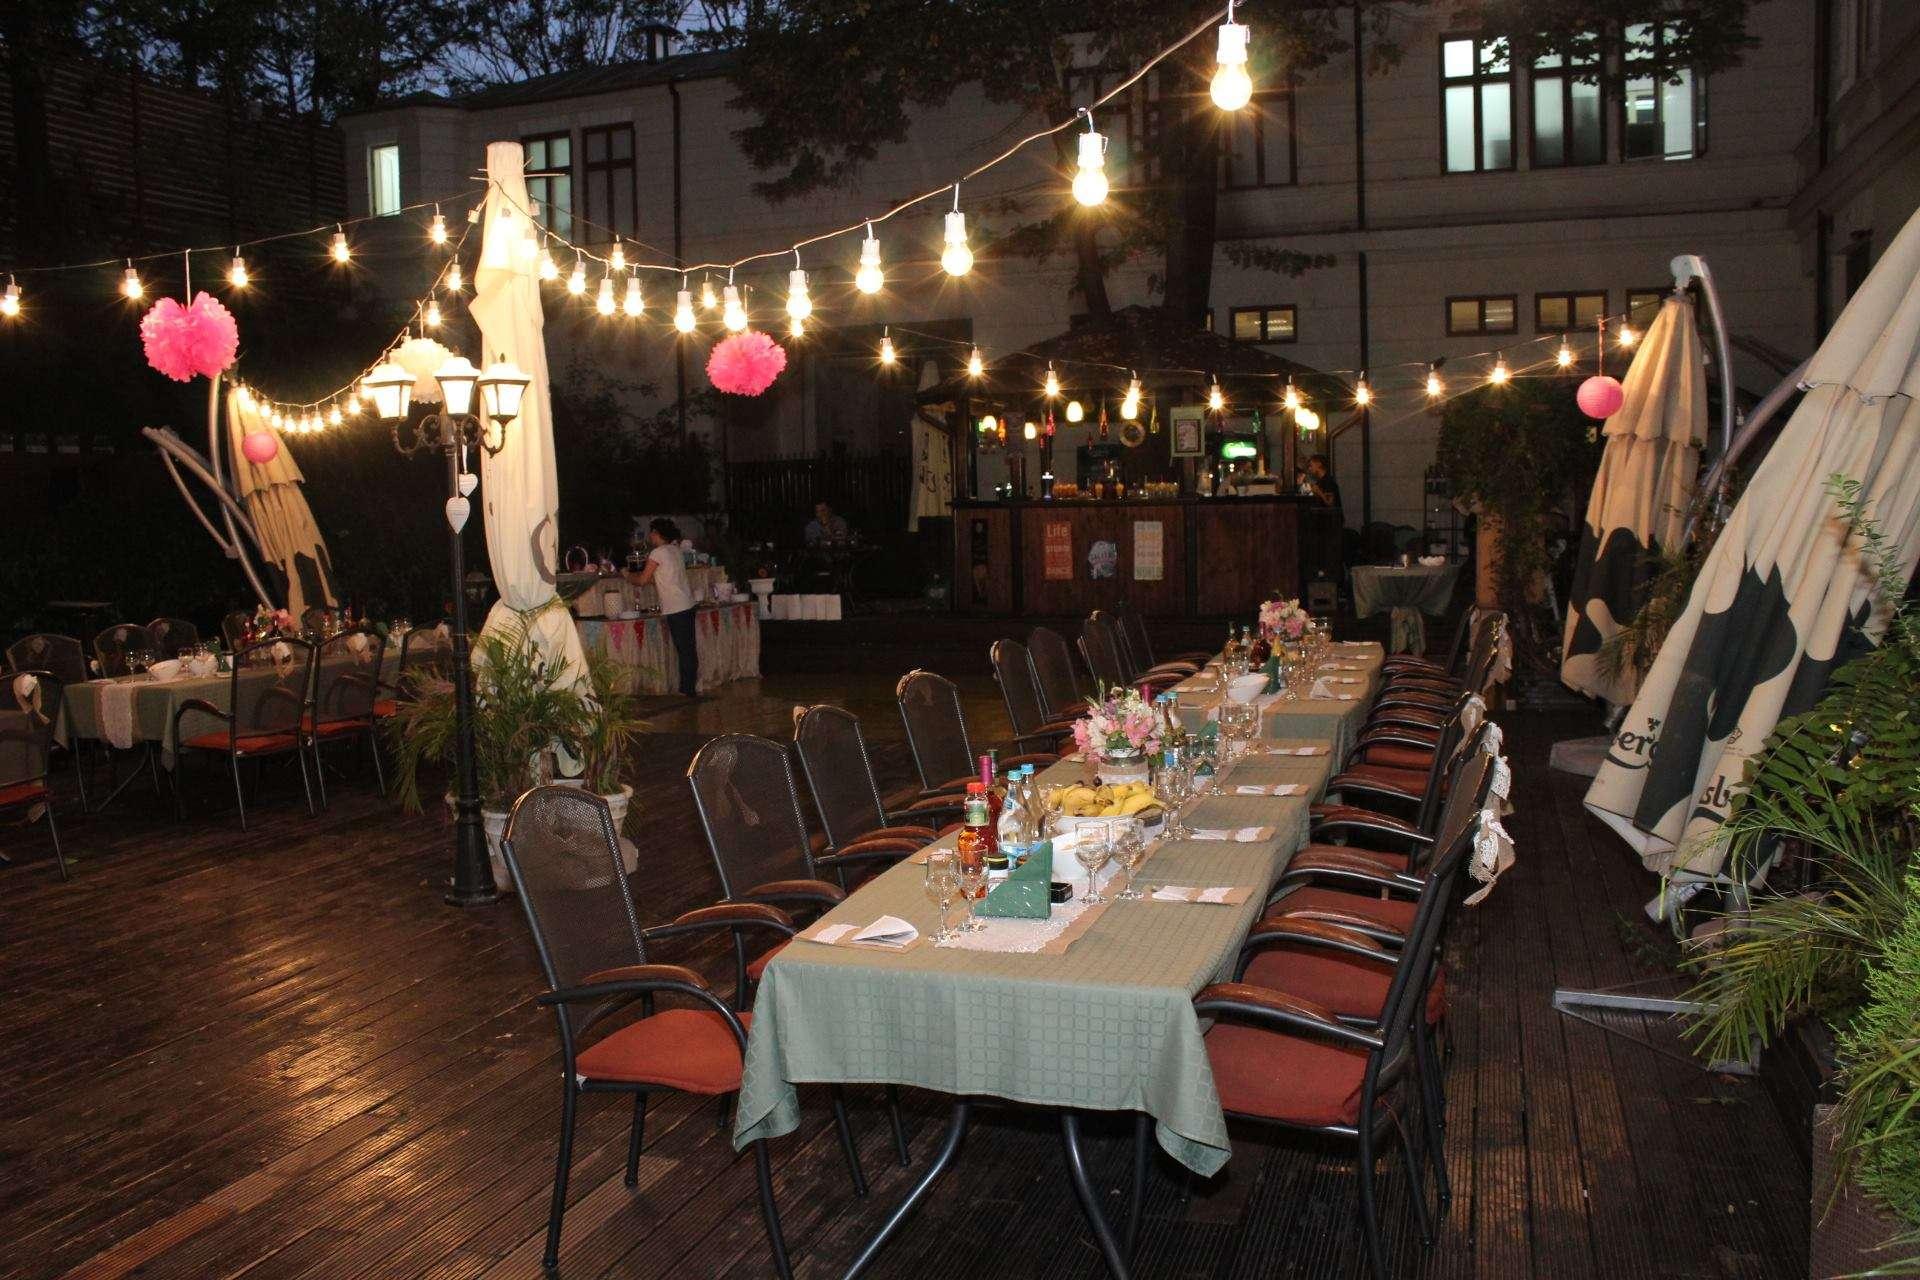 restaurante nunti bucuresti forum